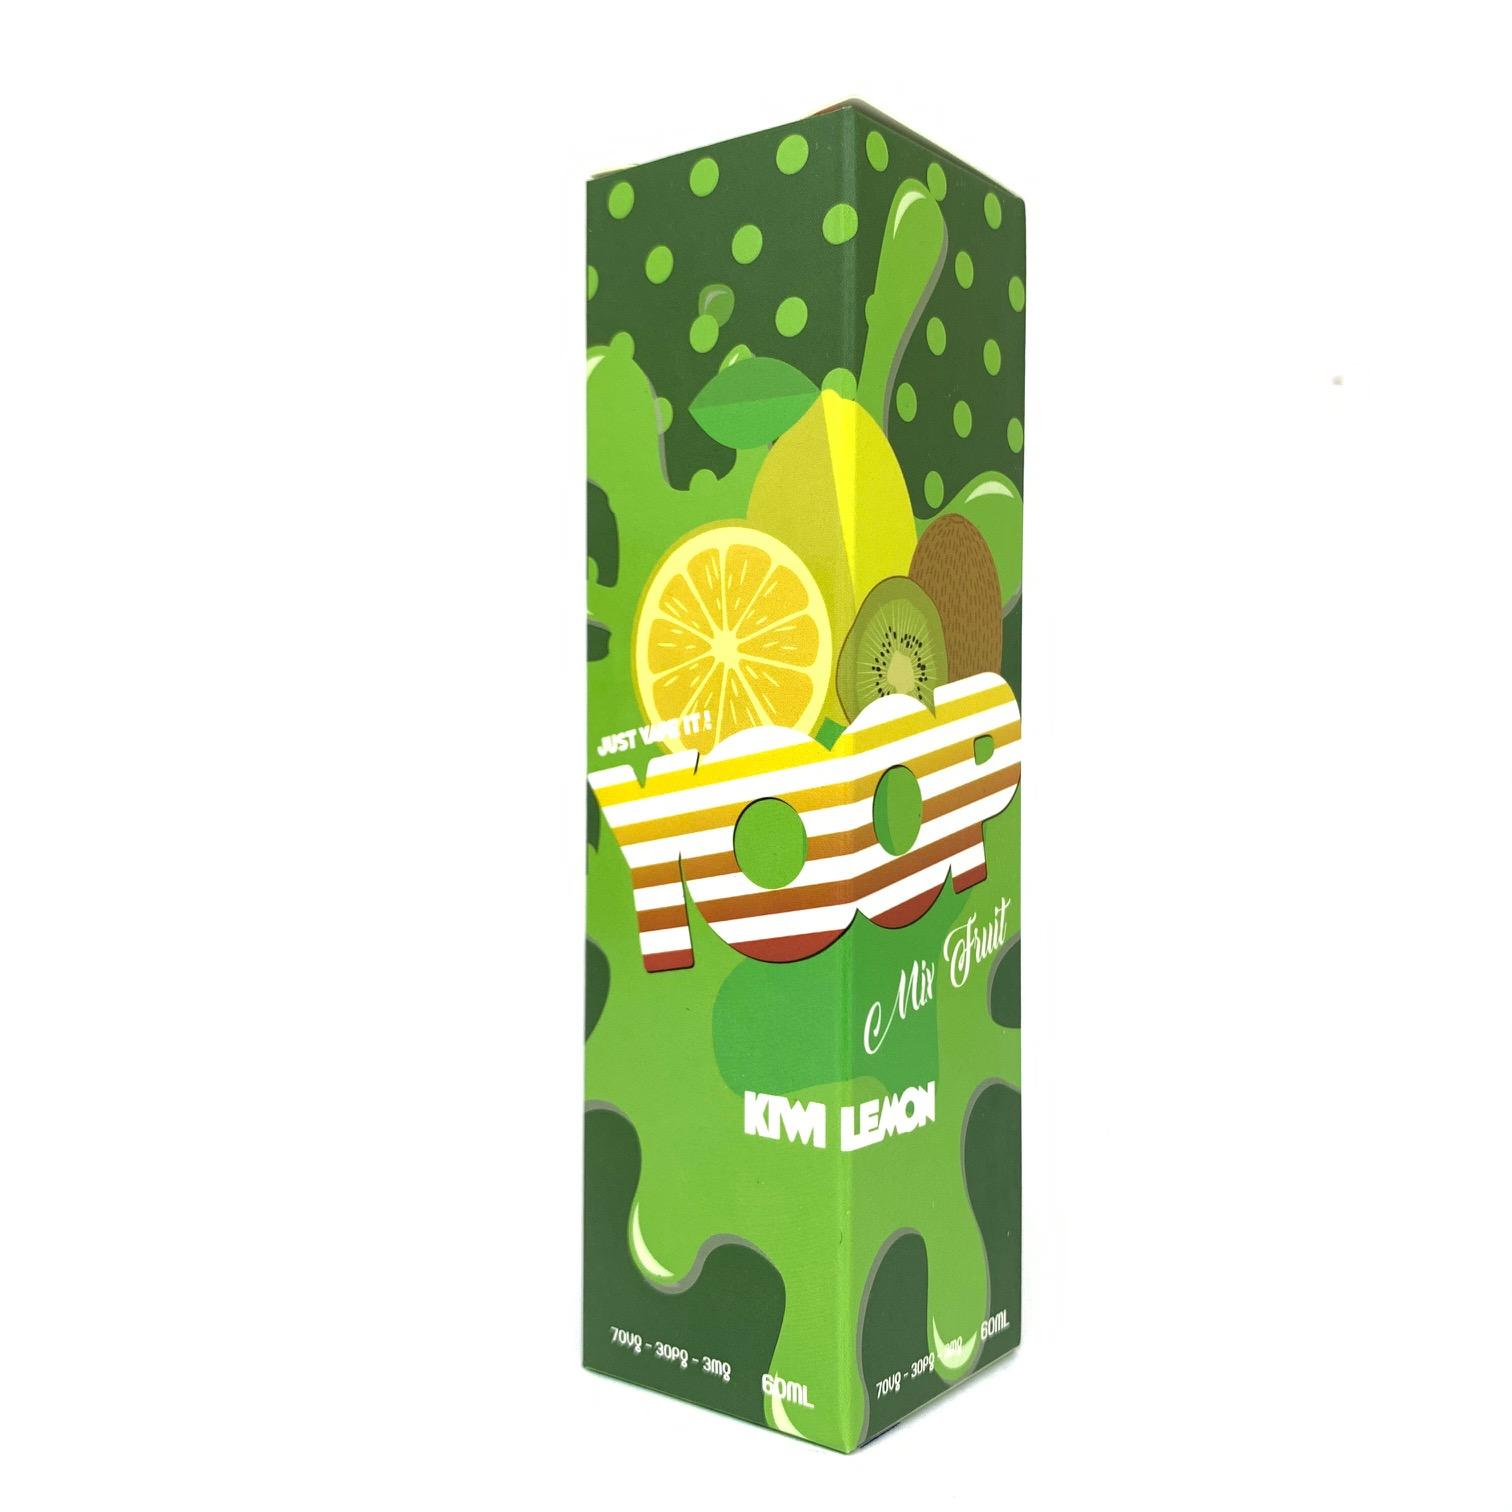 MR YOOP - Kiwi Lemon 60ml